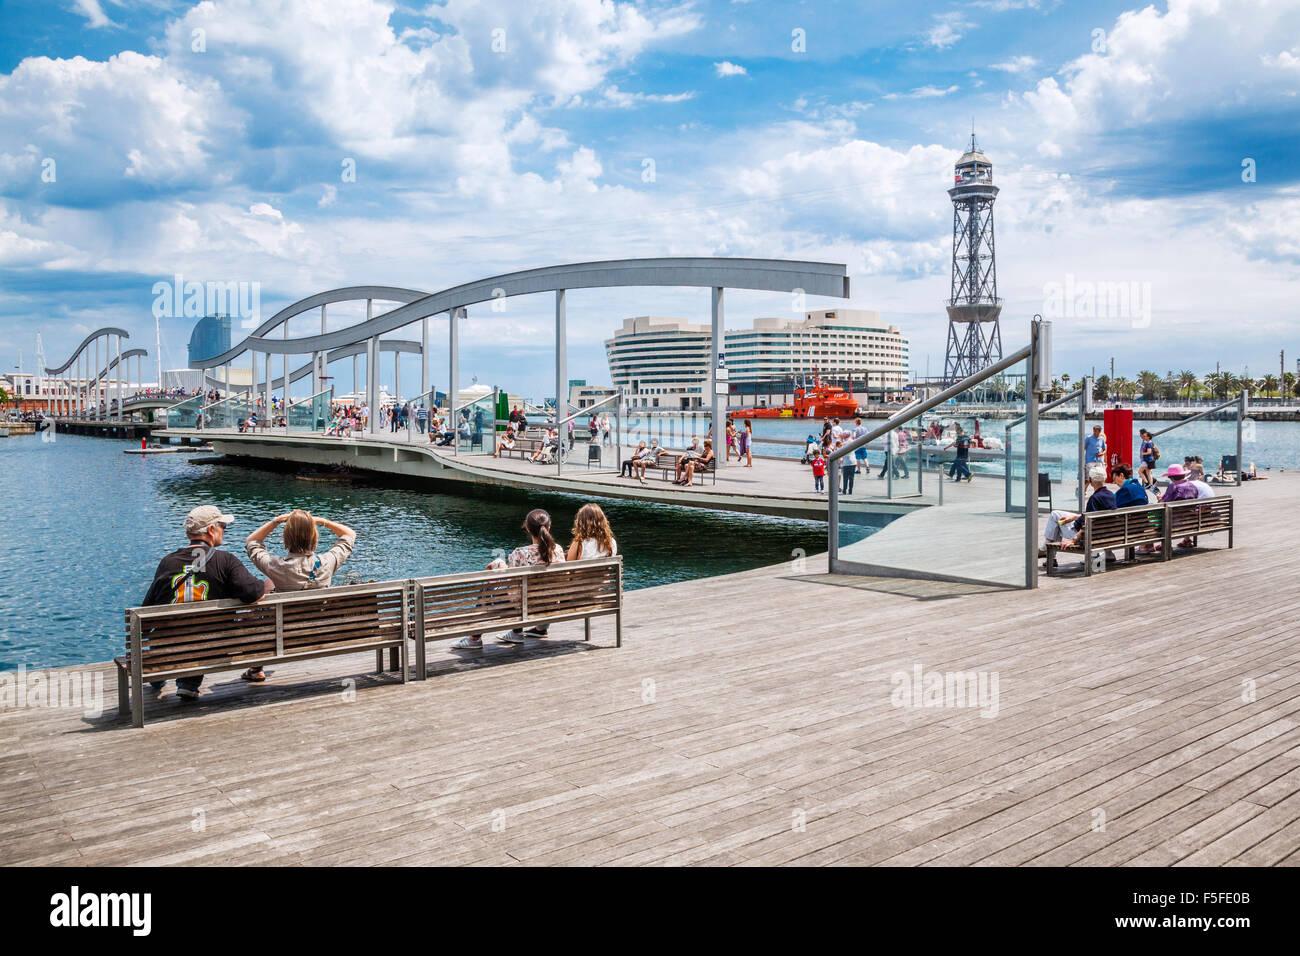 Spain, Catatonia, Barcelona, Port Vell, Rambla del Mar, Stock Photo